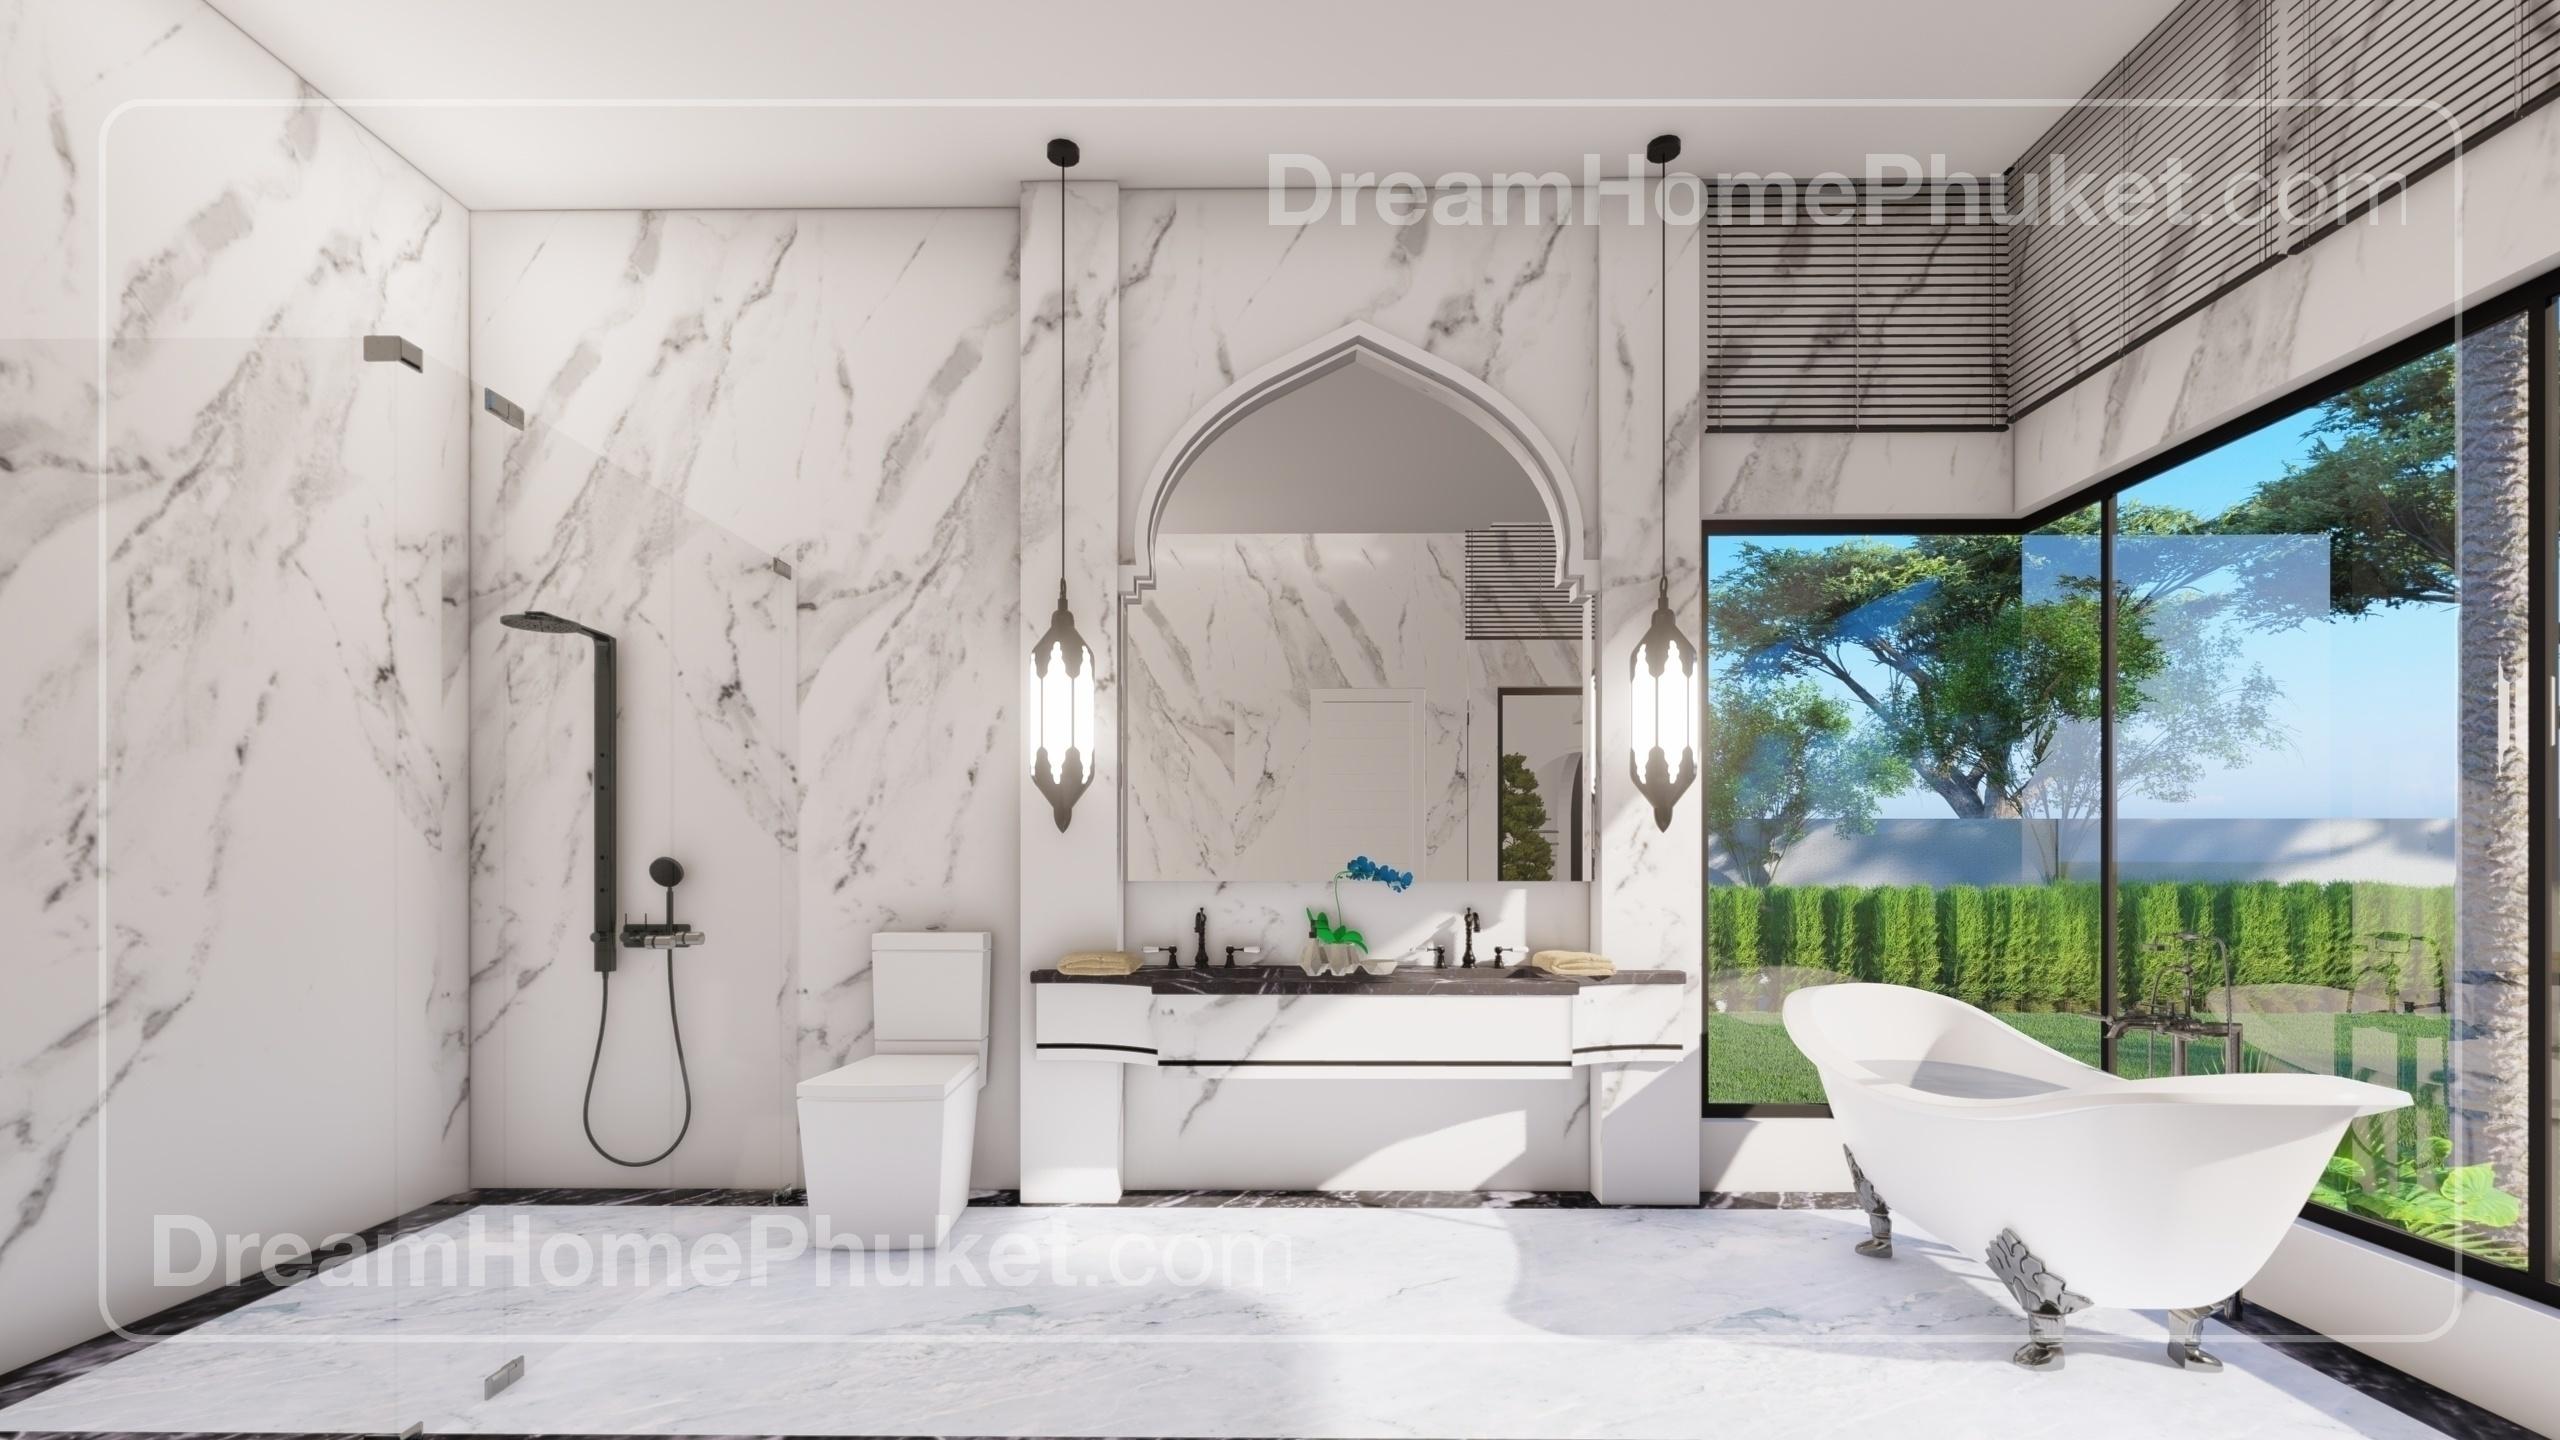 Modern Moroccan Style Villas In Thalang Dream House Phuket